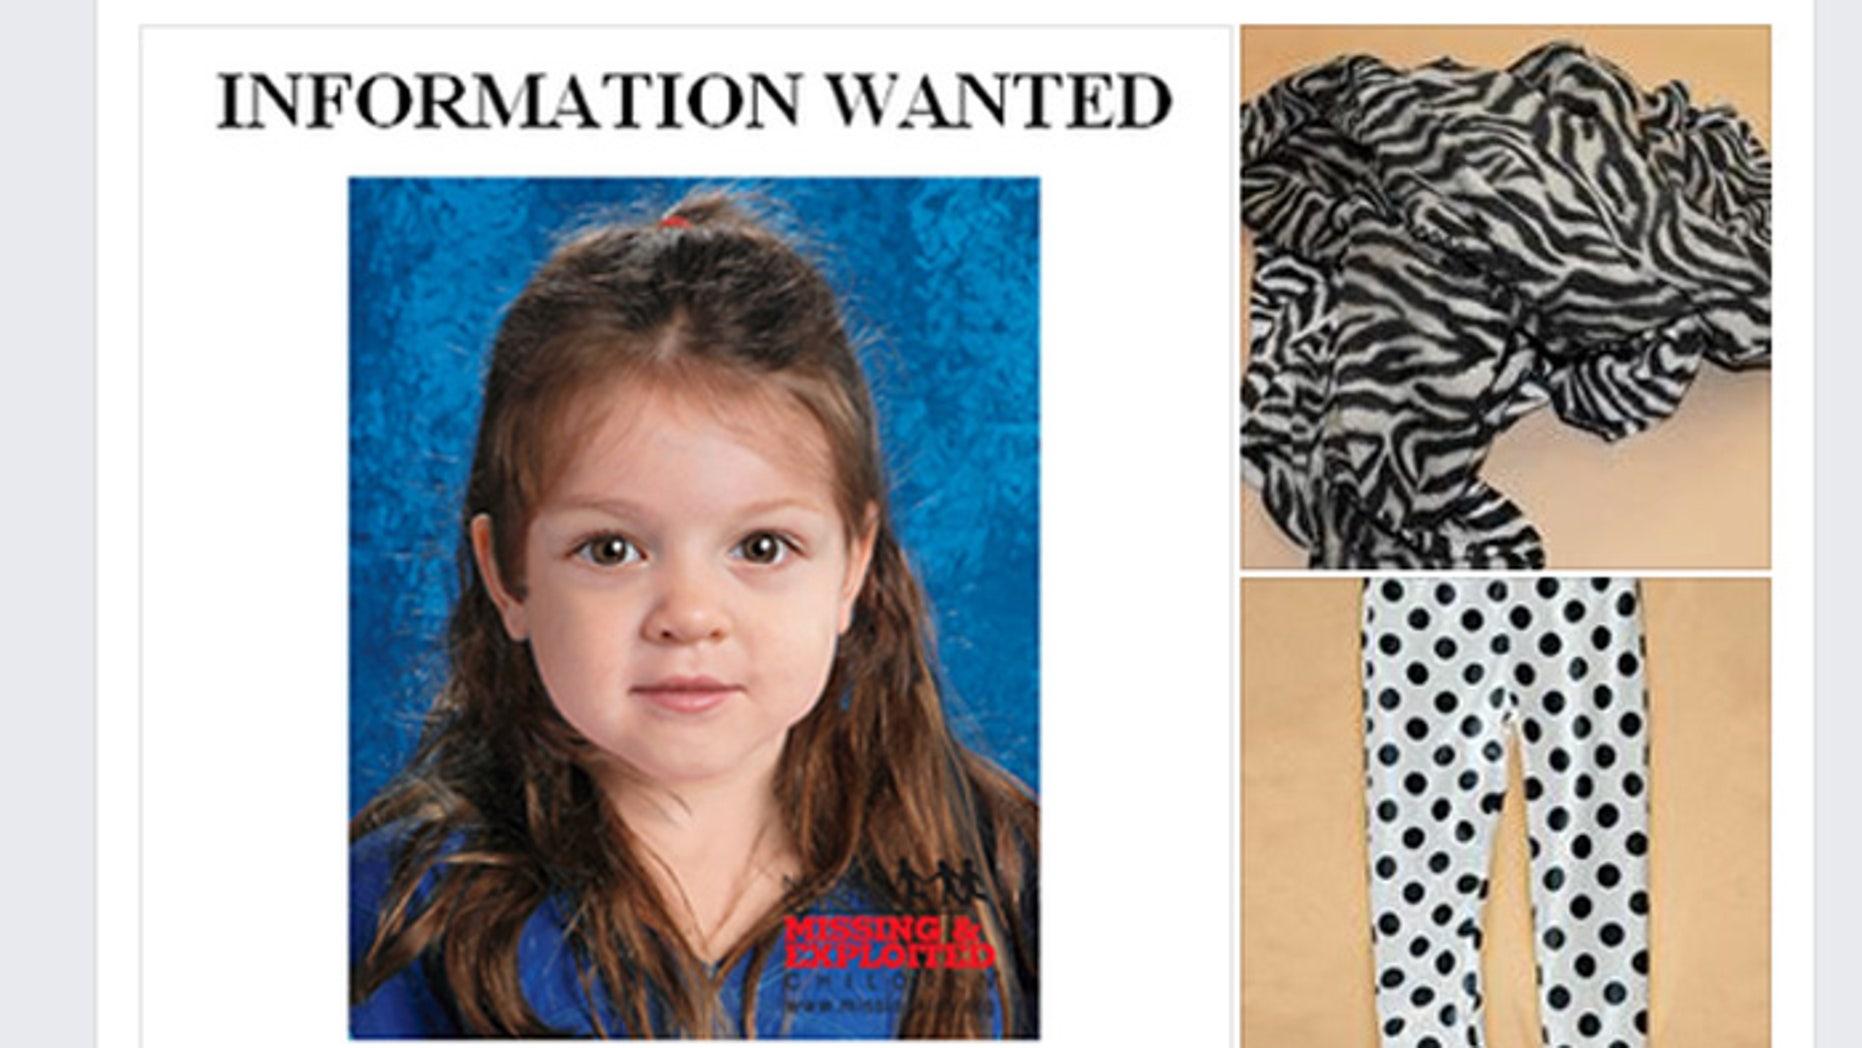 The little girl was wearing polka-dot leggings and a zebra-striped blanket. (Massachusetts State Police)